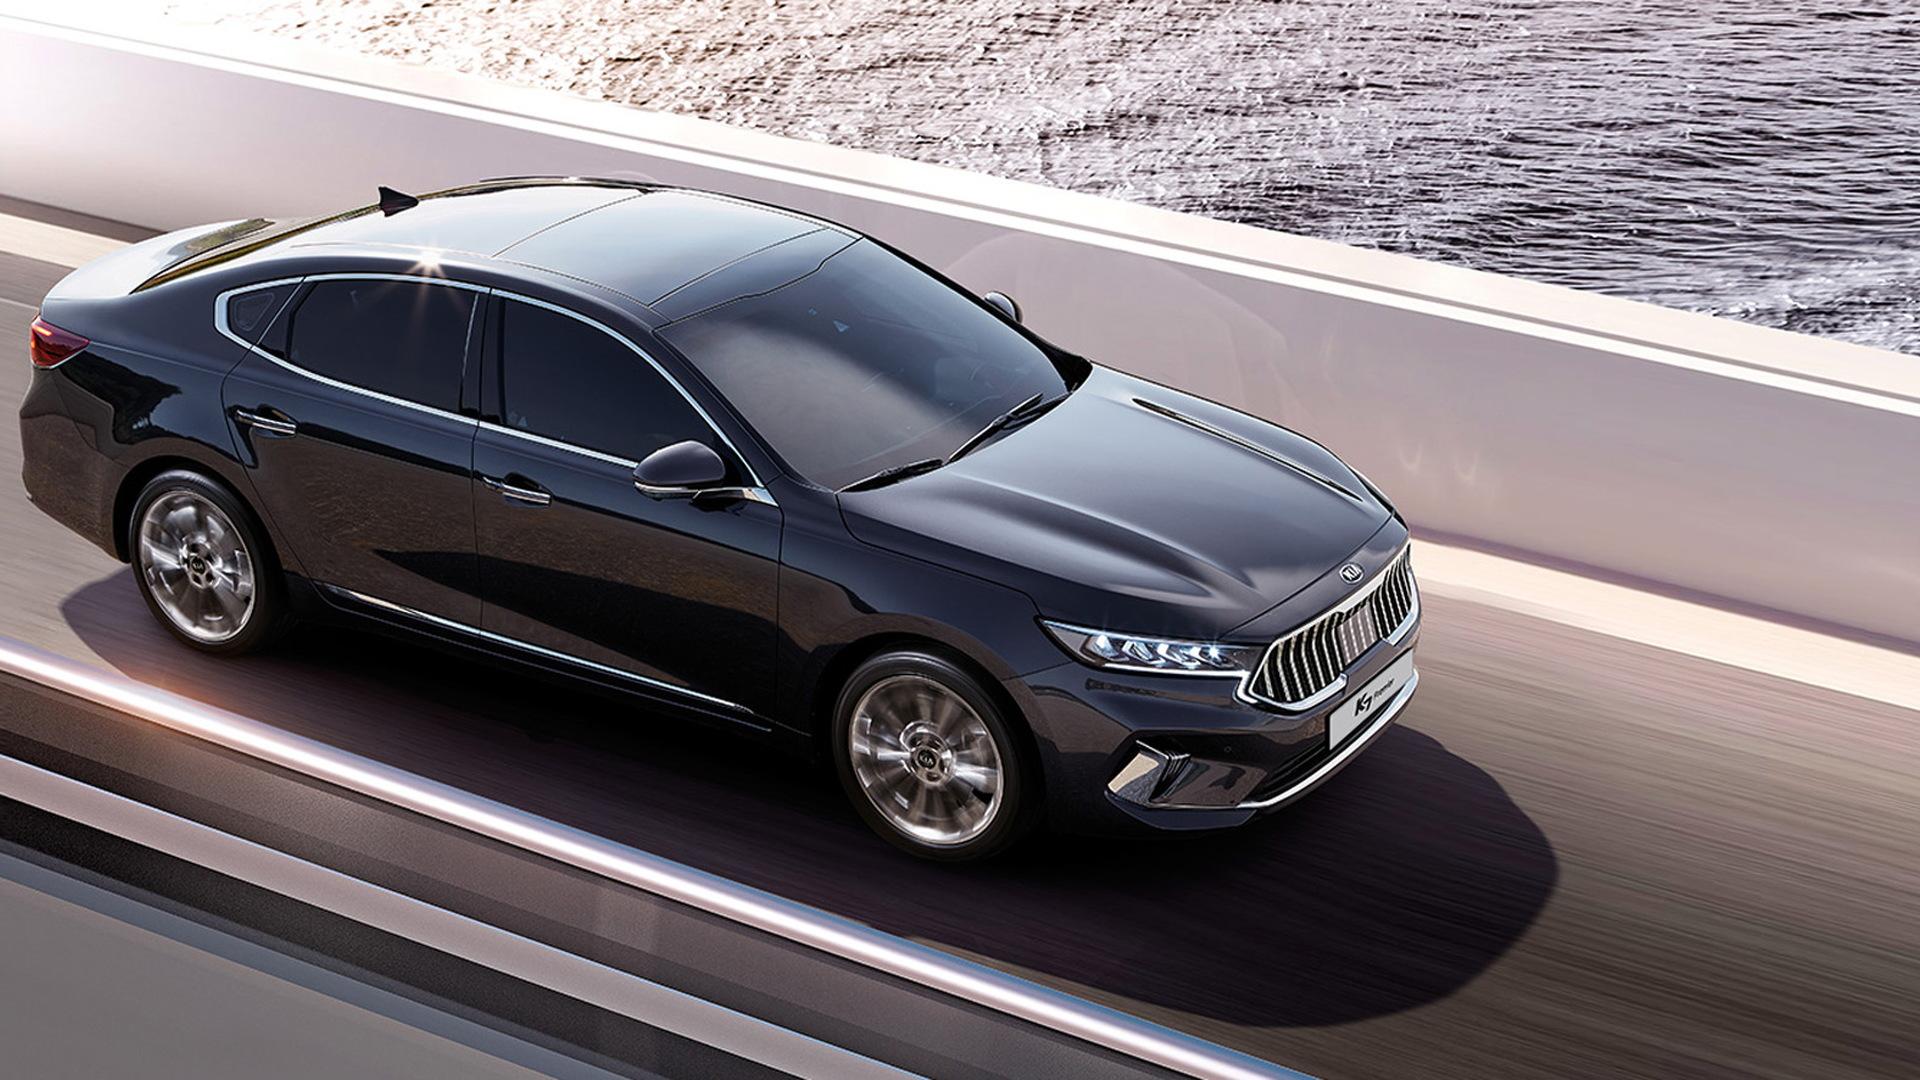 2020 Kia Cadenza (Korean market model)